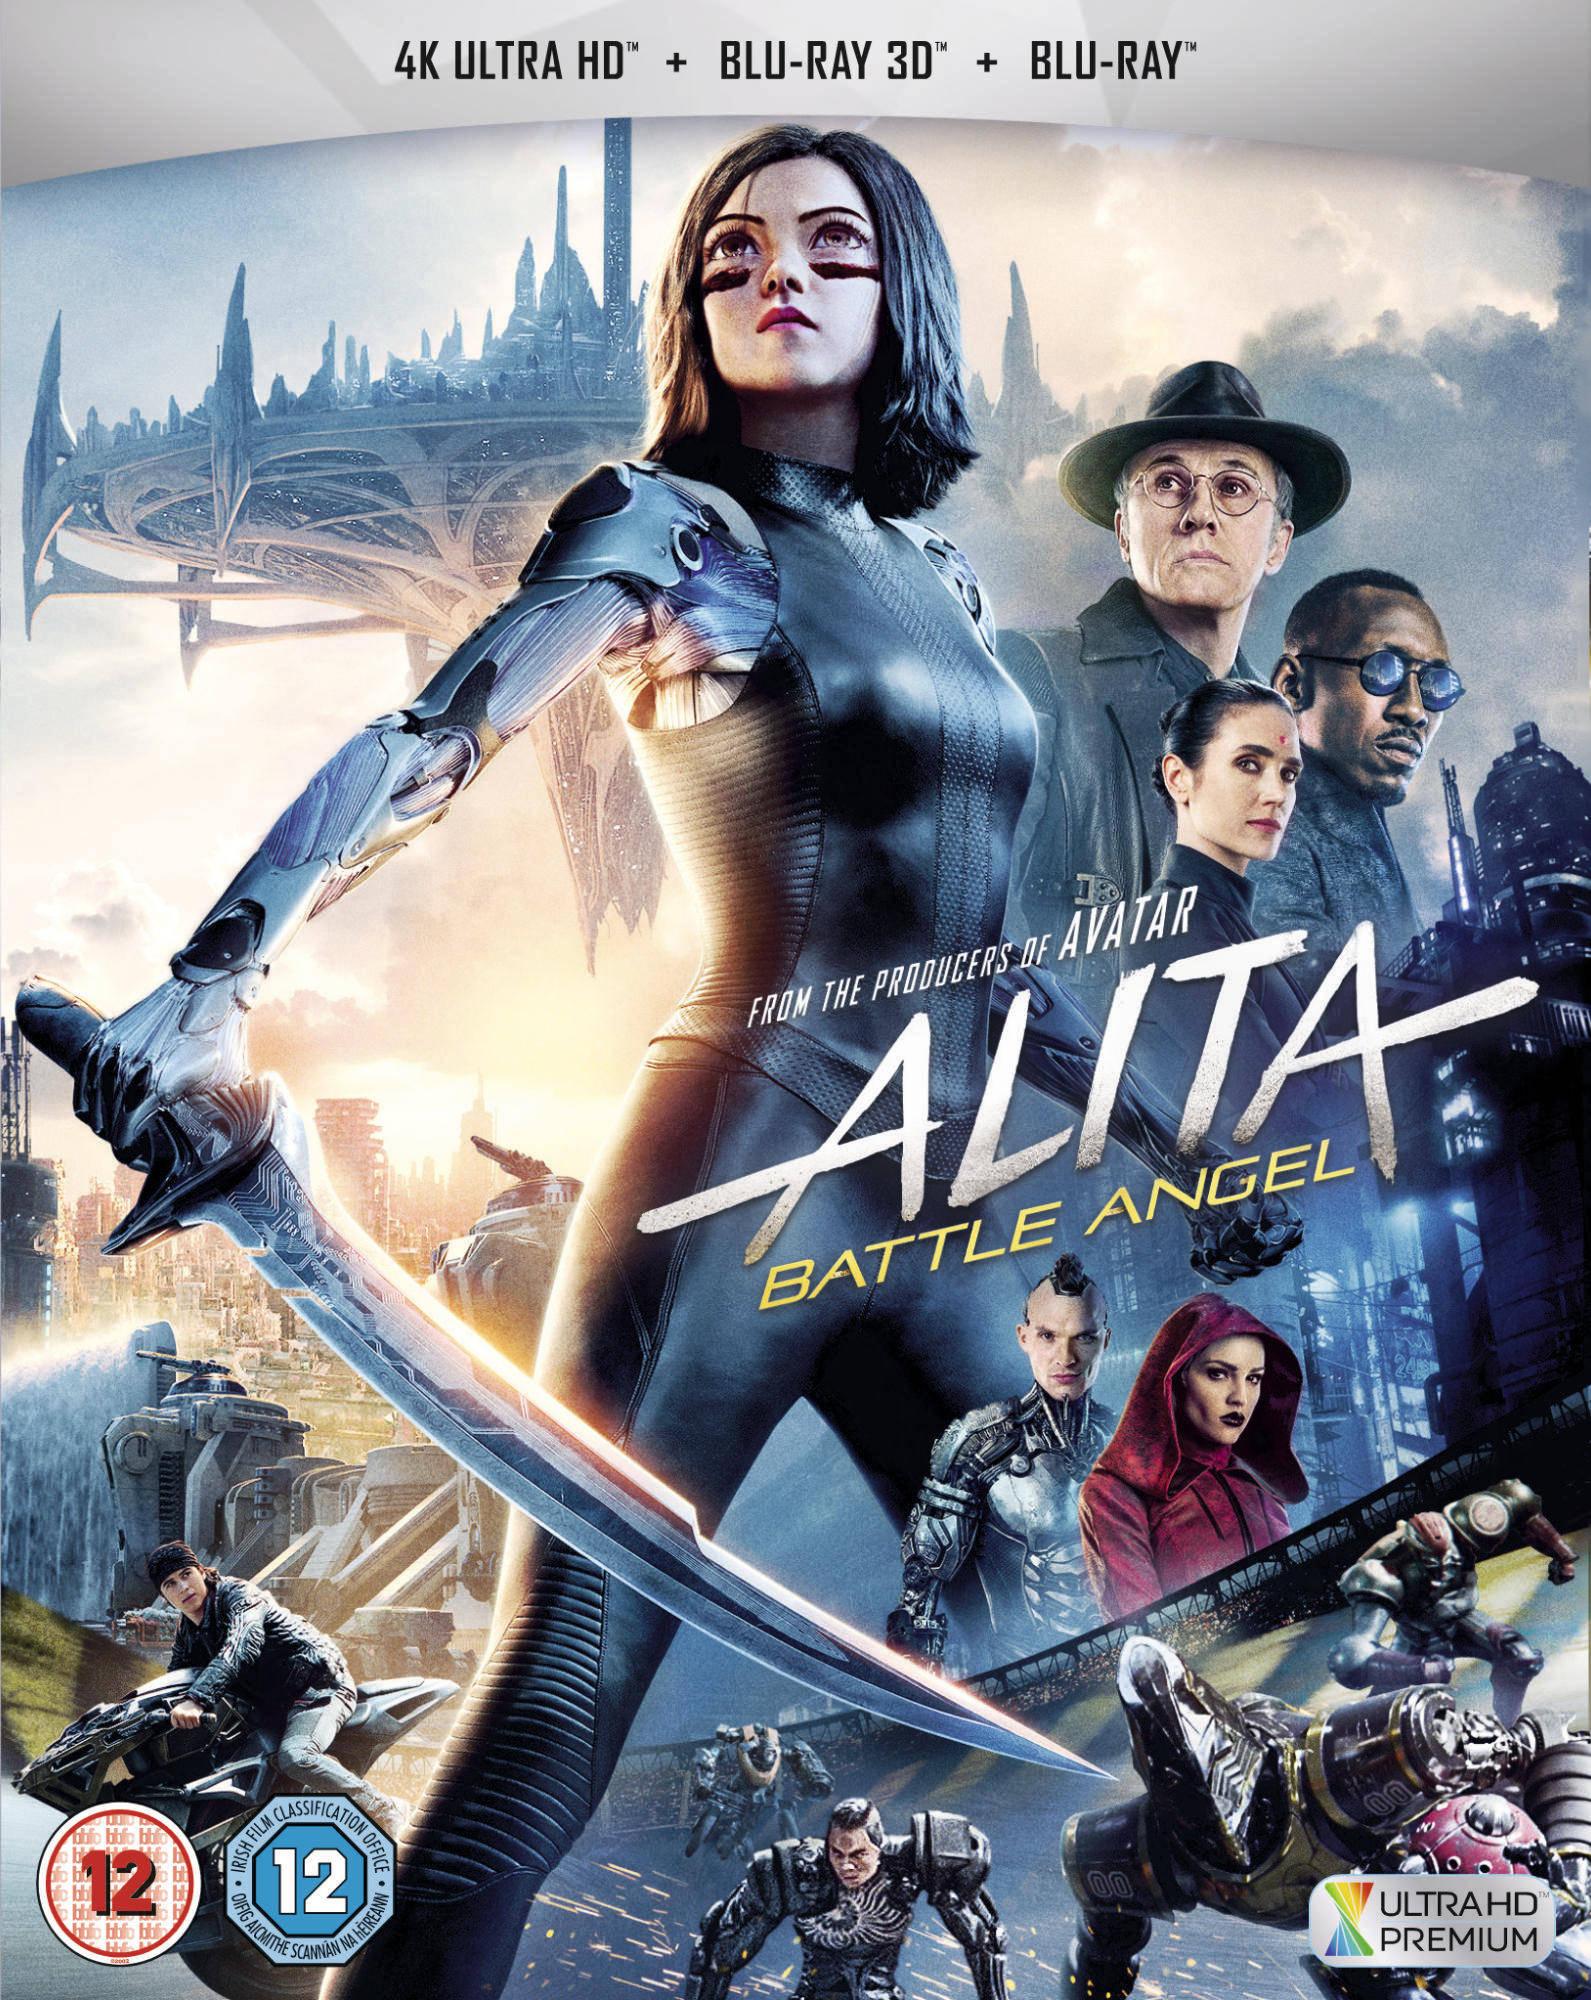 Alita: Battle Angel 4K UHD £4.99 with code @ Chili